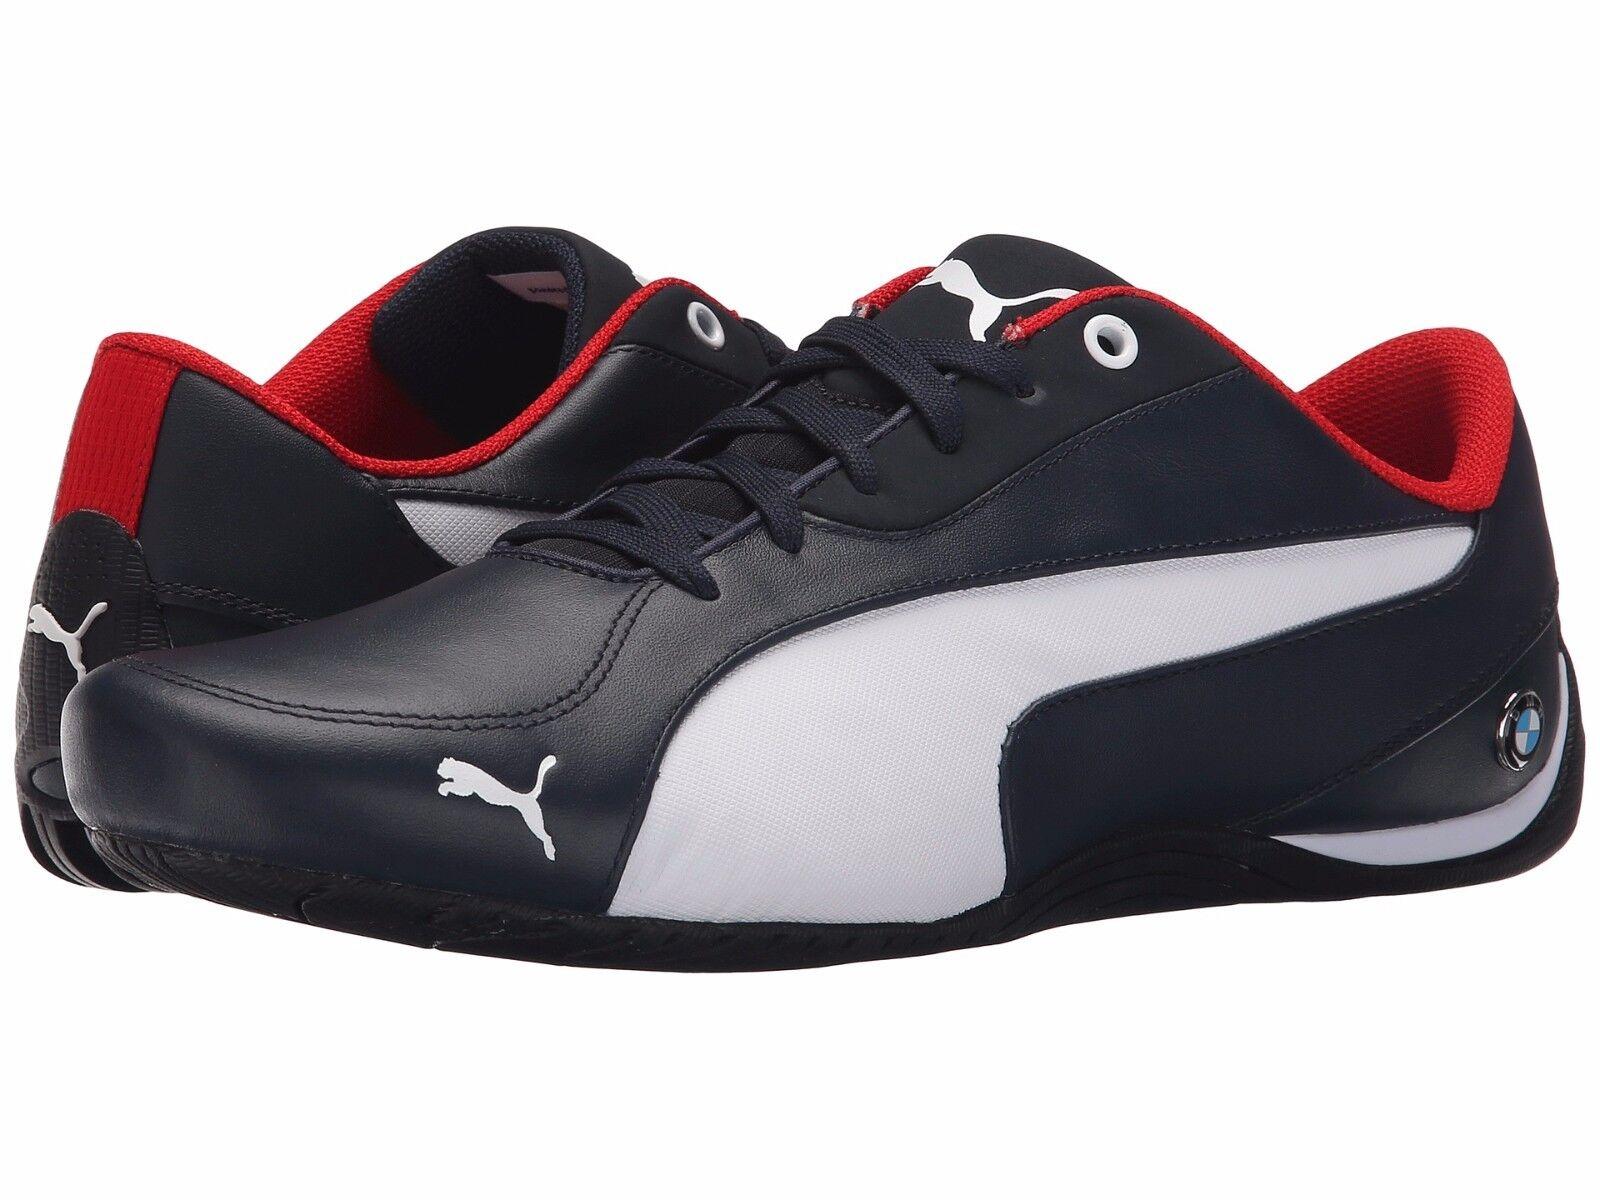 110 NIB Men's PUMA BMW Drift Cat 5 Leather shoes 305648-02 SF bluee Navy